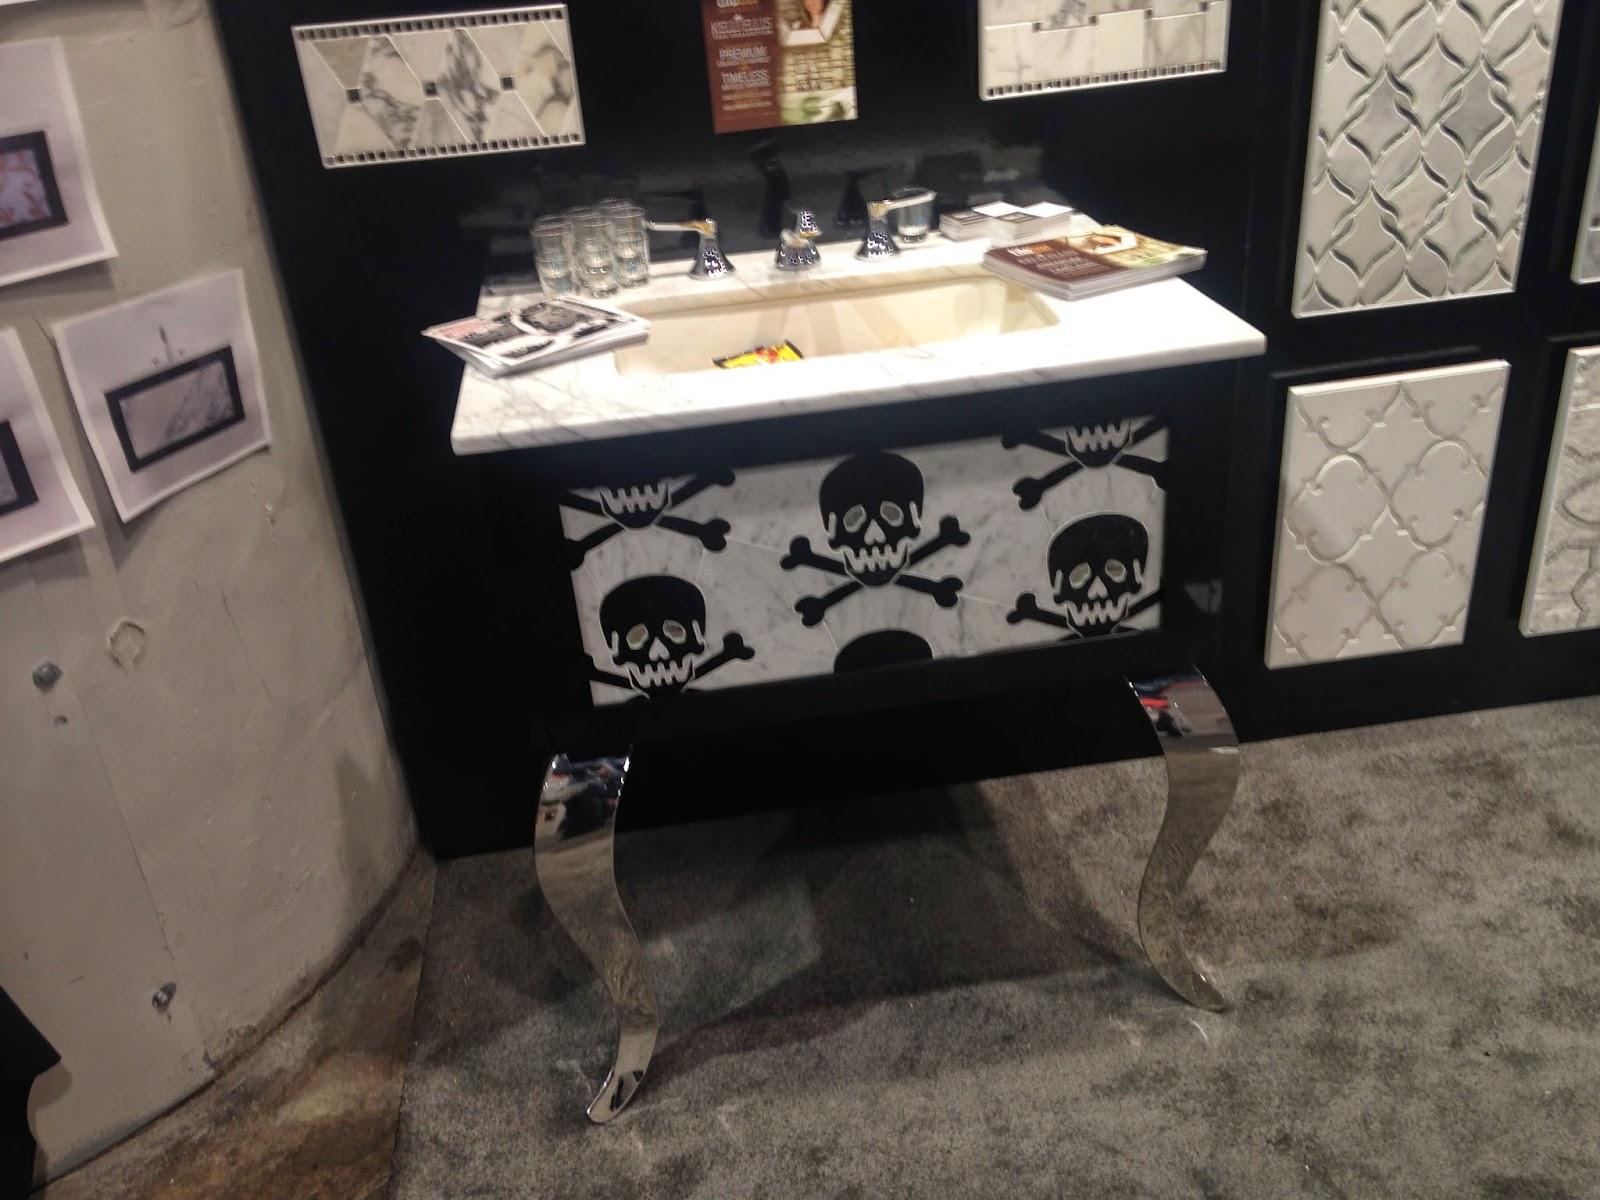 Skull Bathroom Sink : TheBuilderFix: Skull and Crossbones, a new designer trend? What do you ...